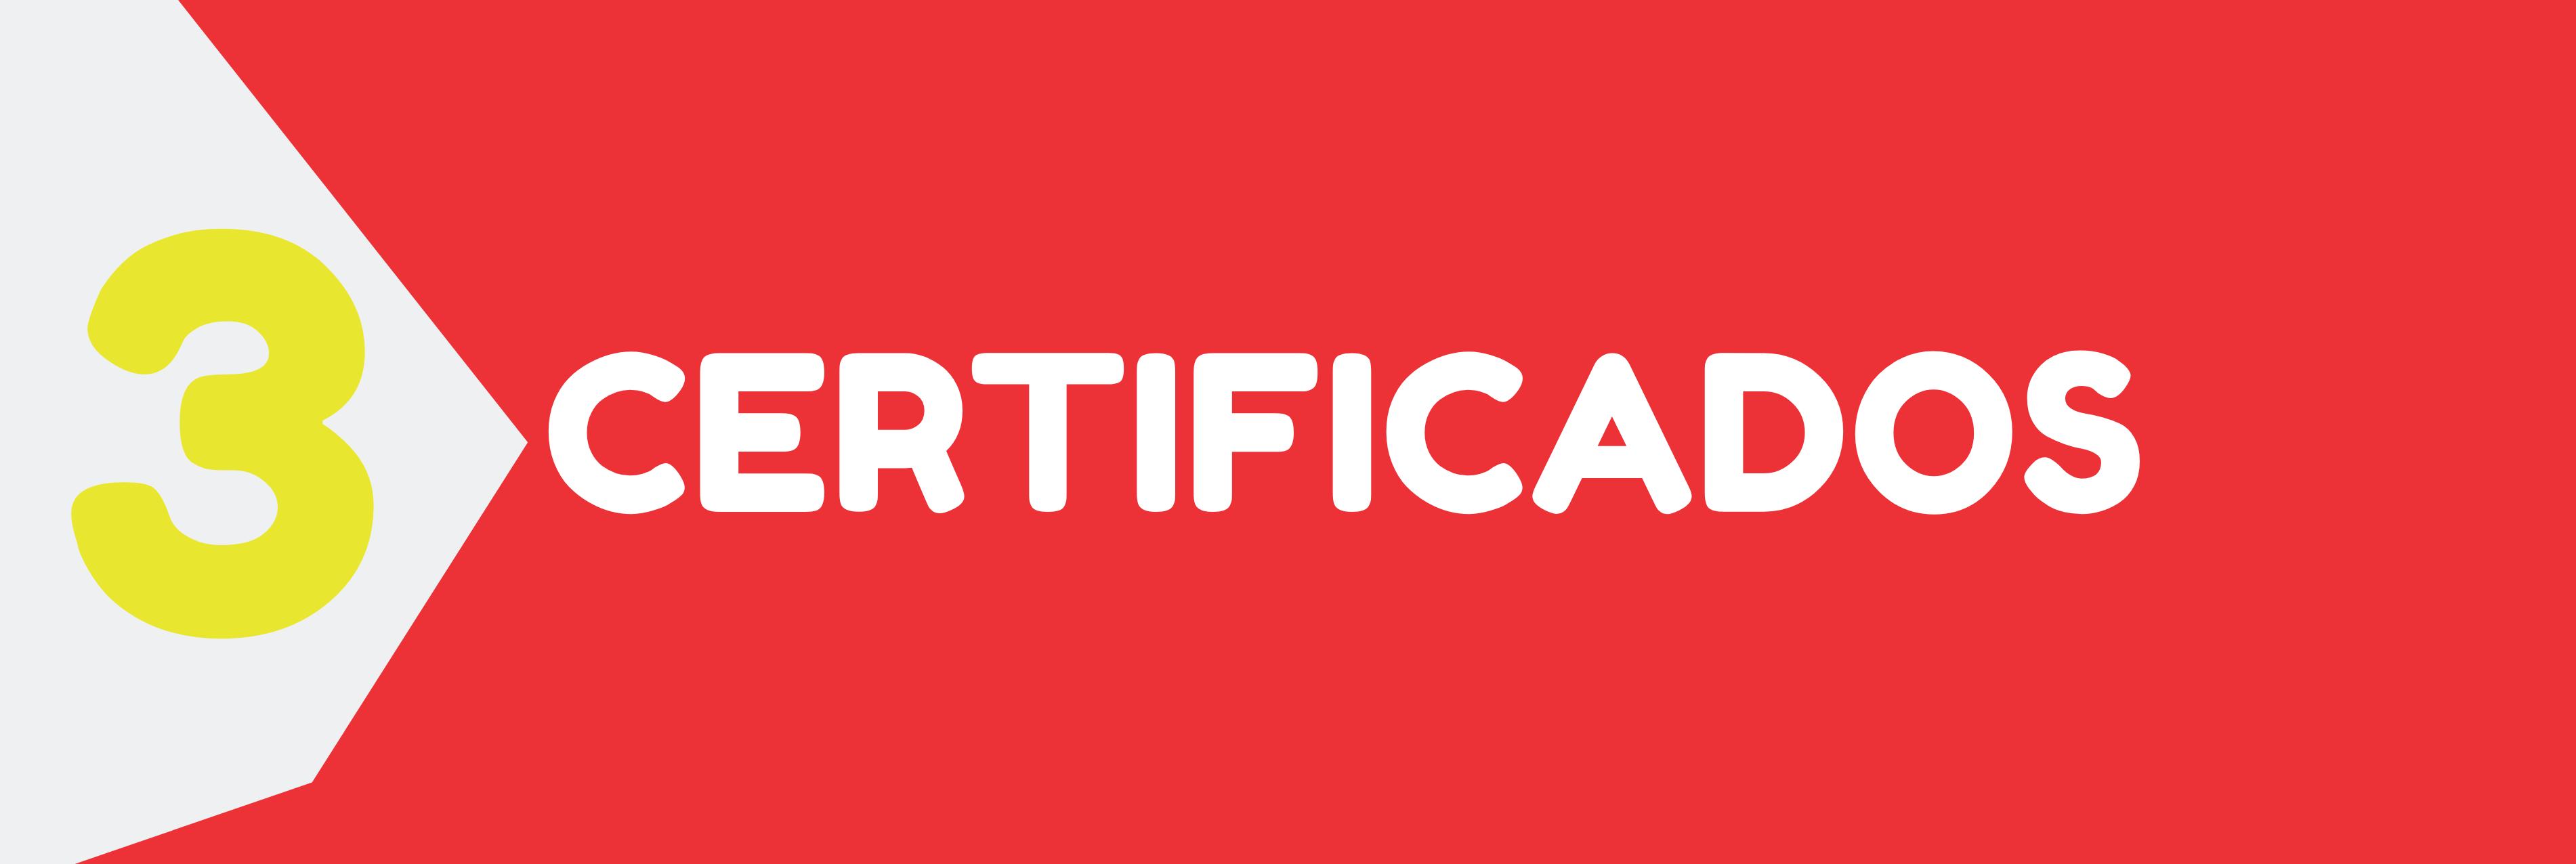 http://ccmagangue.org.co/media/imagenes/serviciosvirtuales/certificados